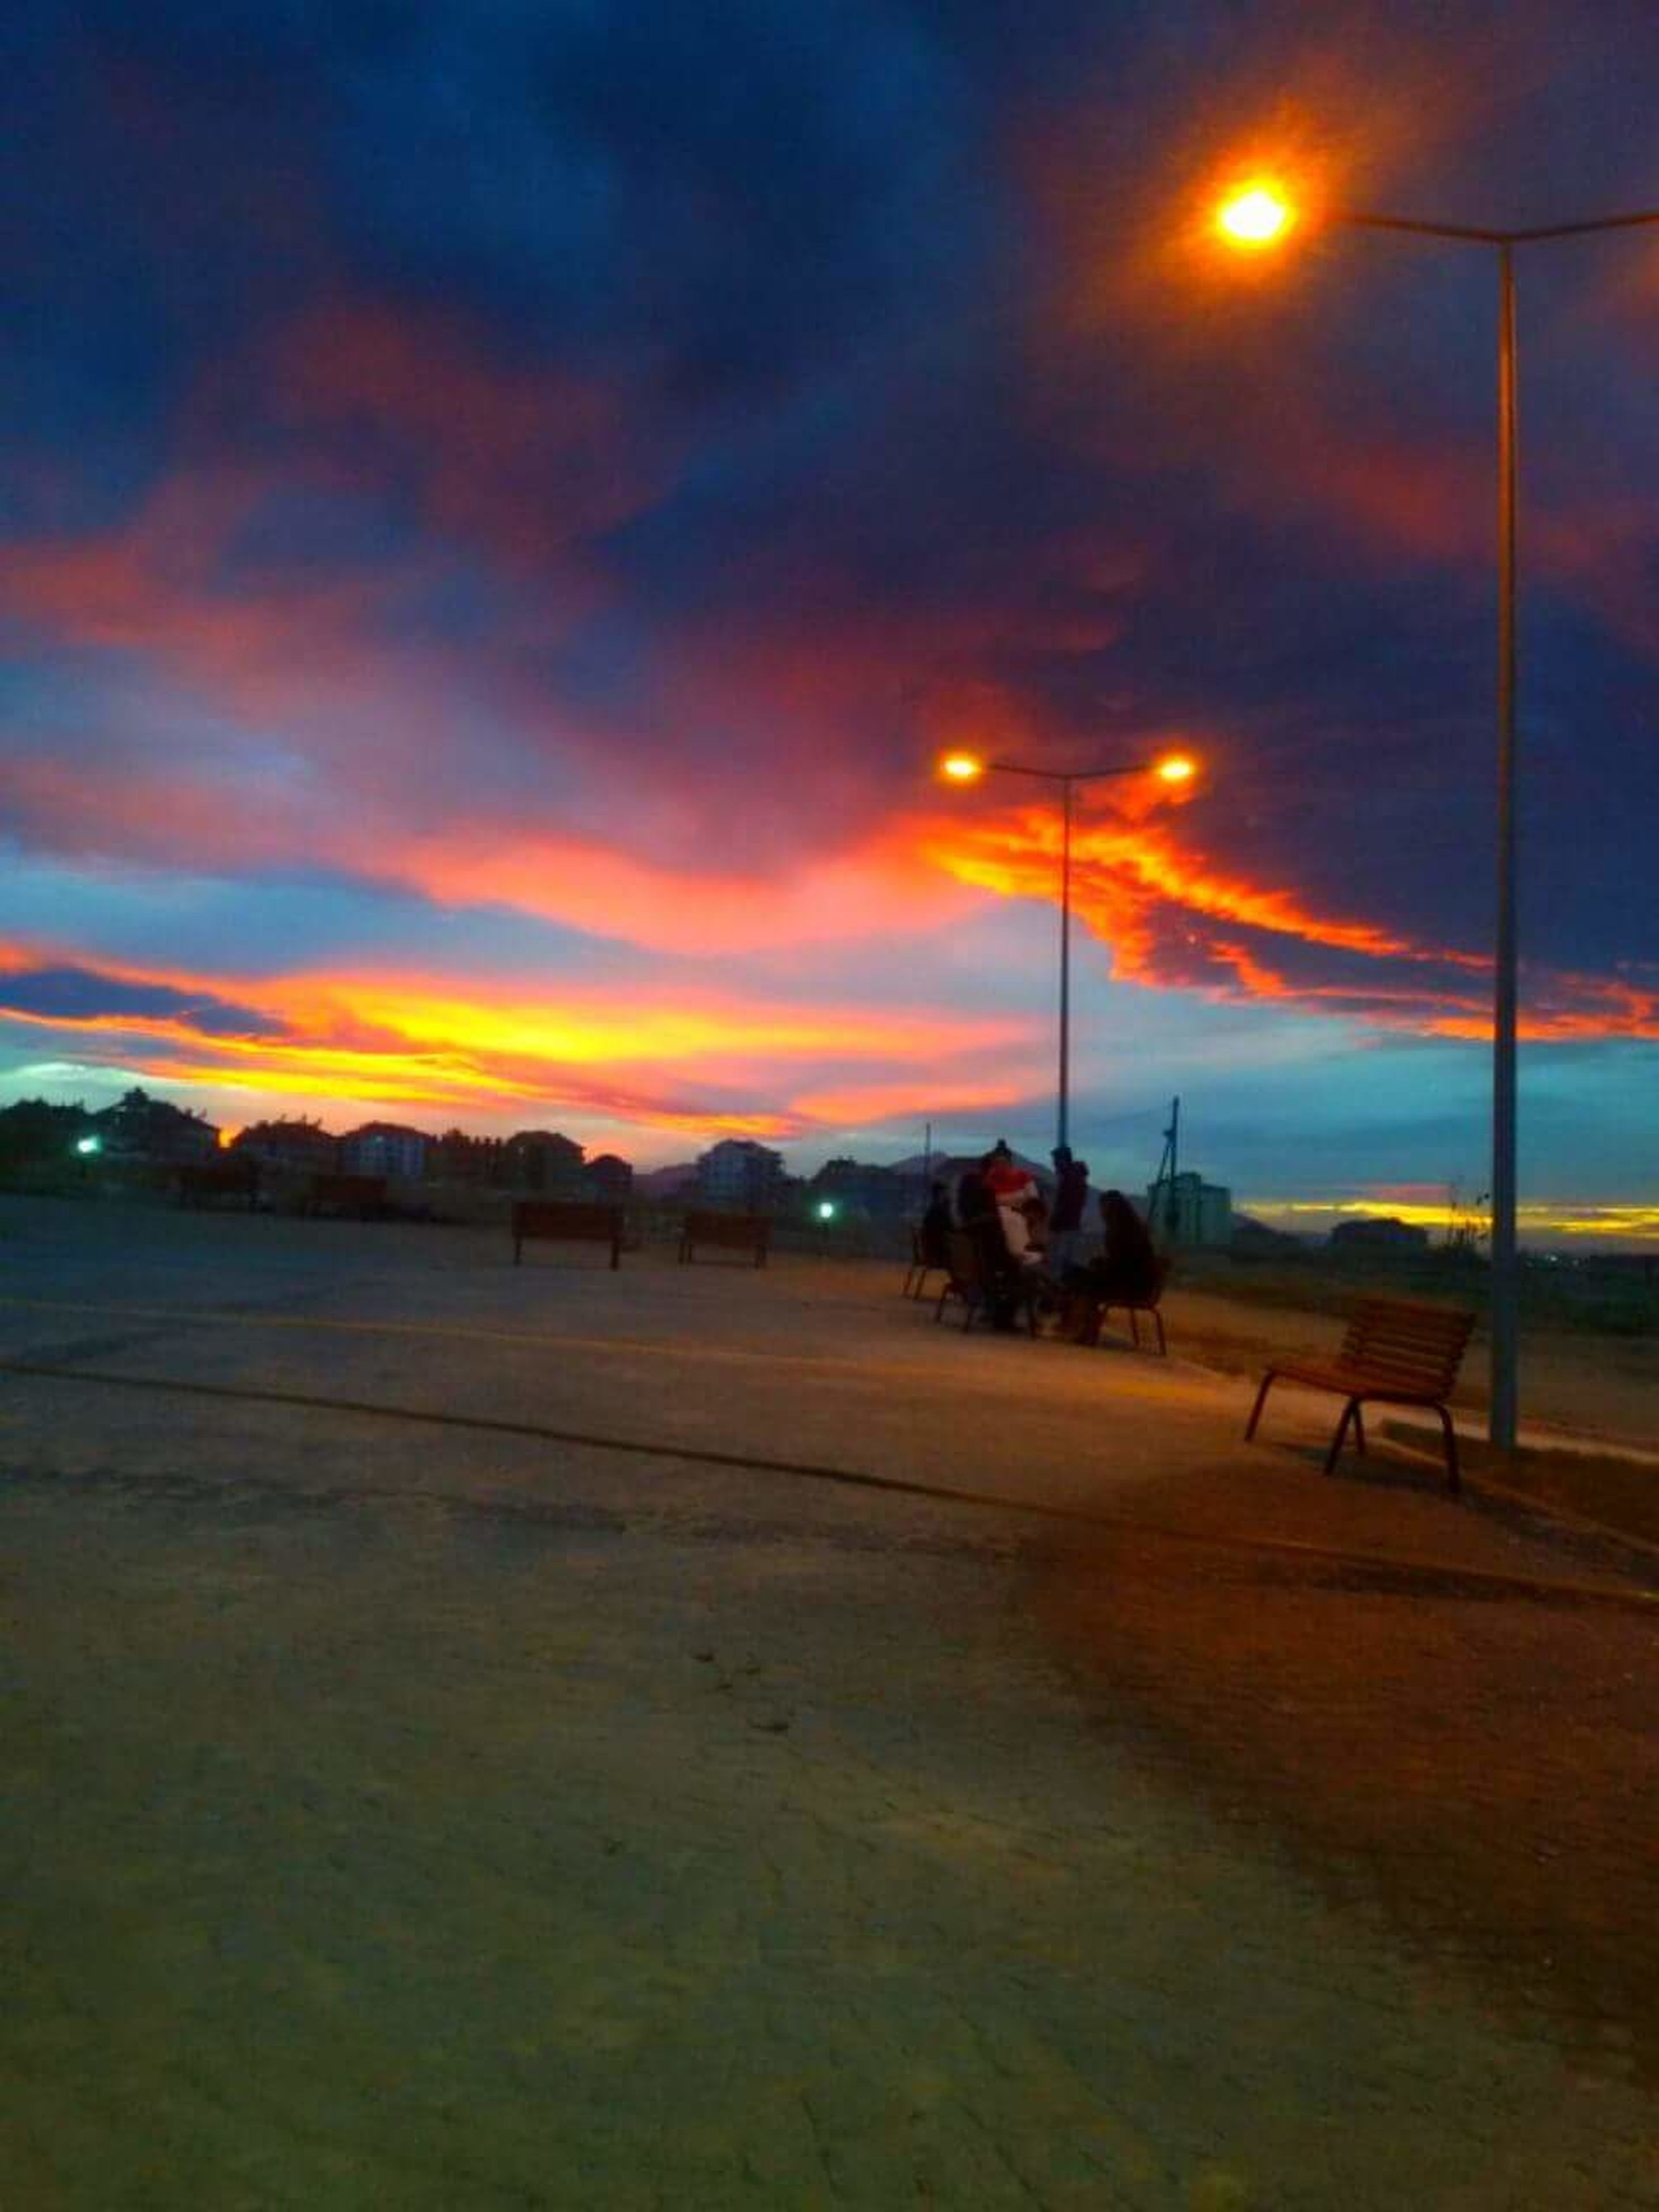 sunset, sky, nature, beauty in nature, cloud - sky, outdoors, illuminated, domestic animals, scenics, beach, no people, animal themes, mammal, night